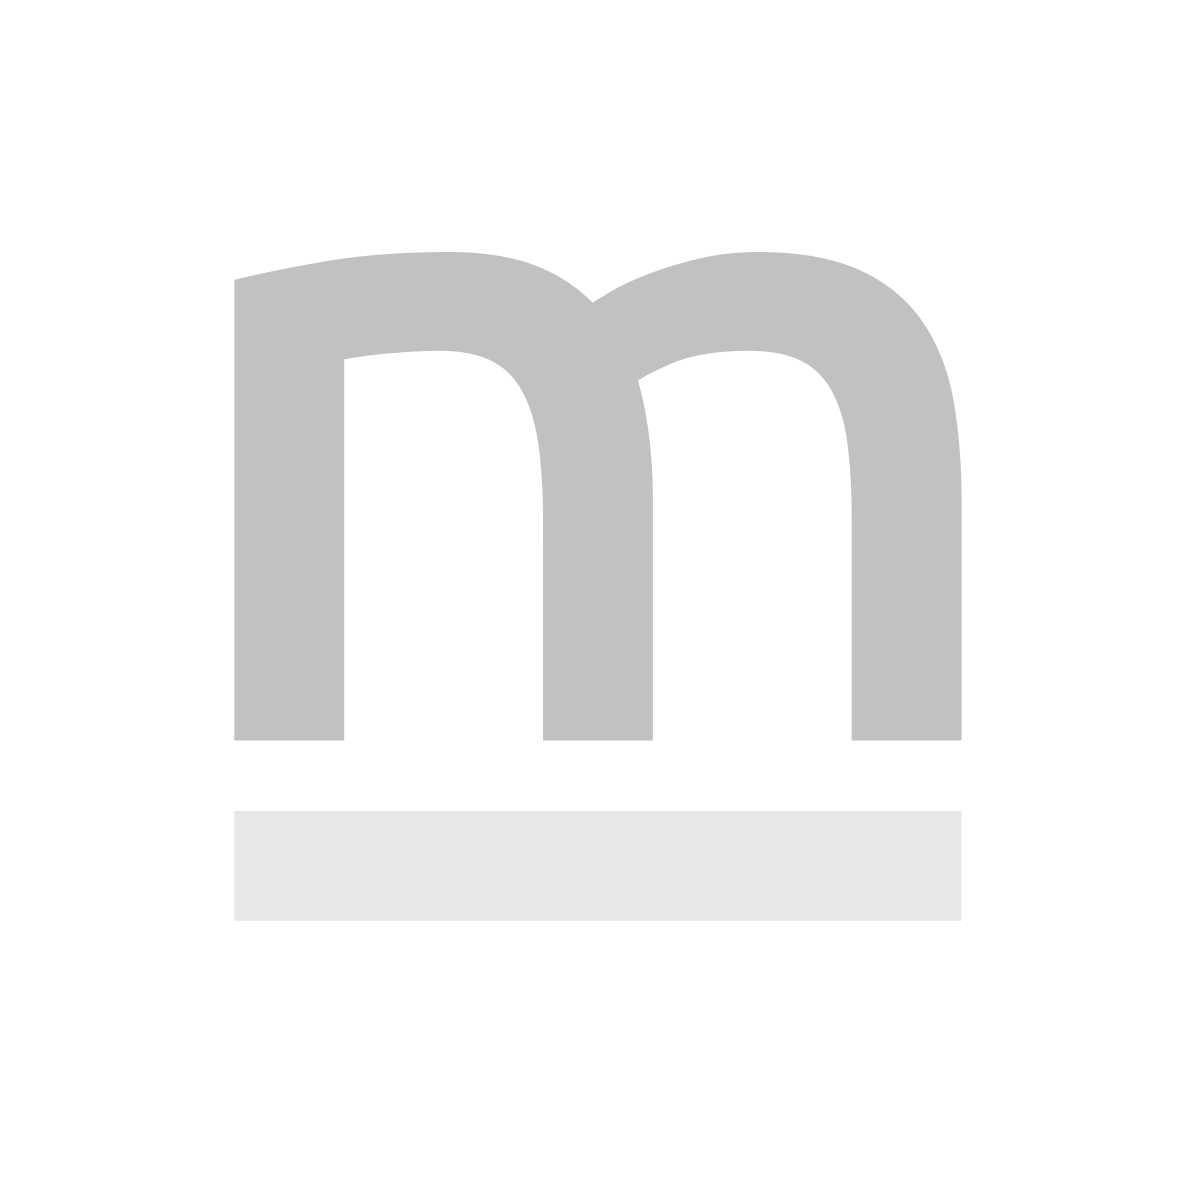 Pokrowiec na materac SPIN 140x200